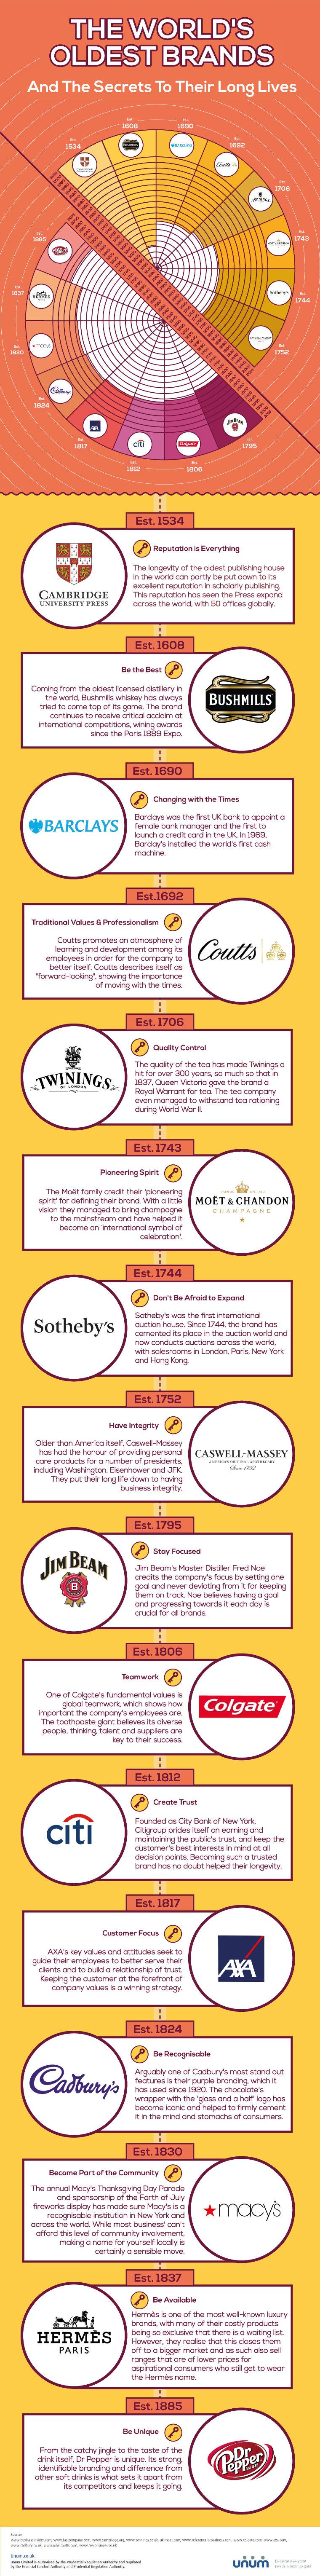 Oldest brands' secrets - infographic by Unum